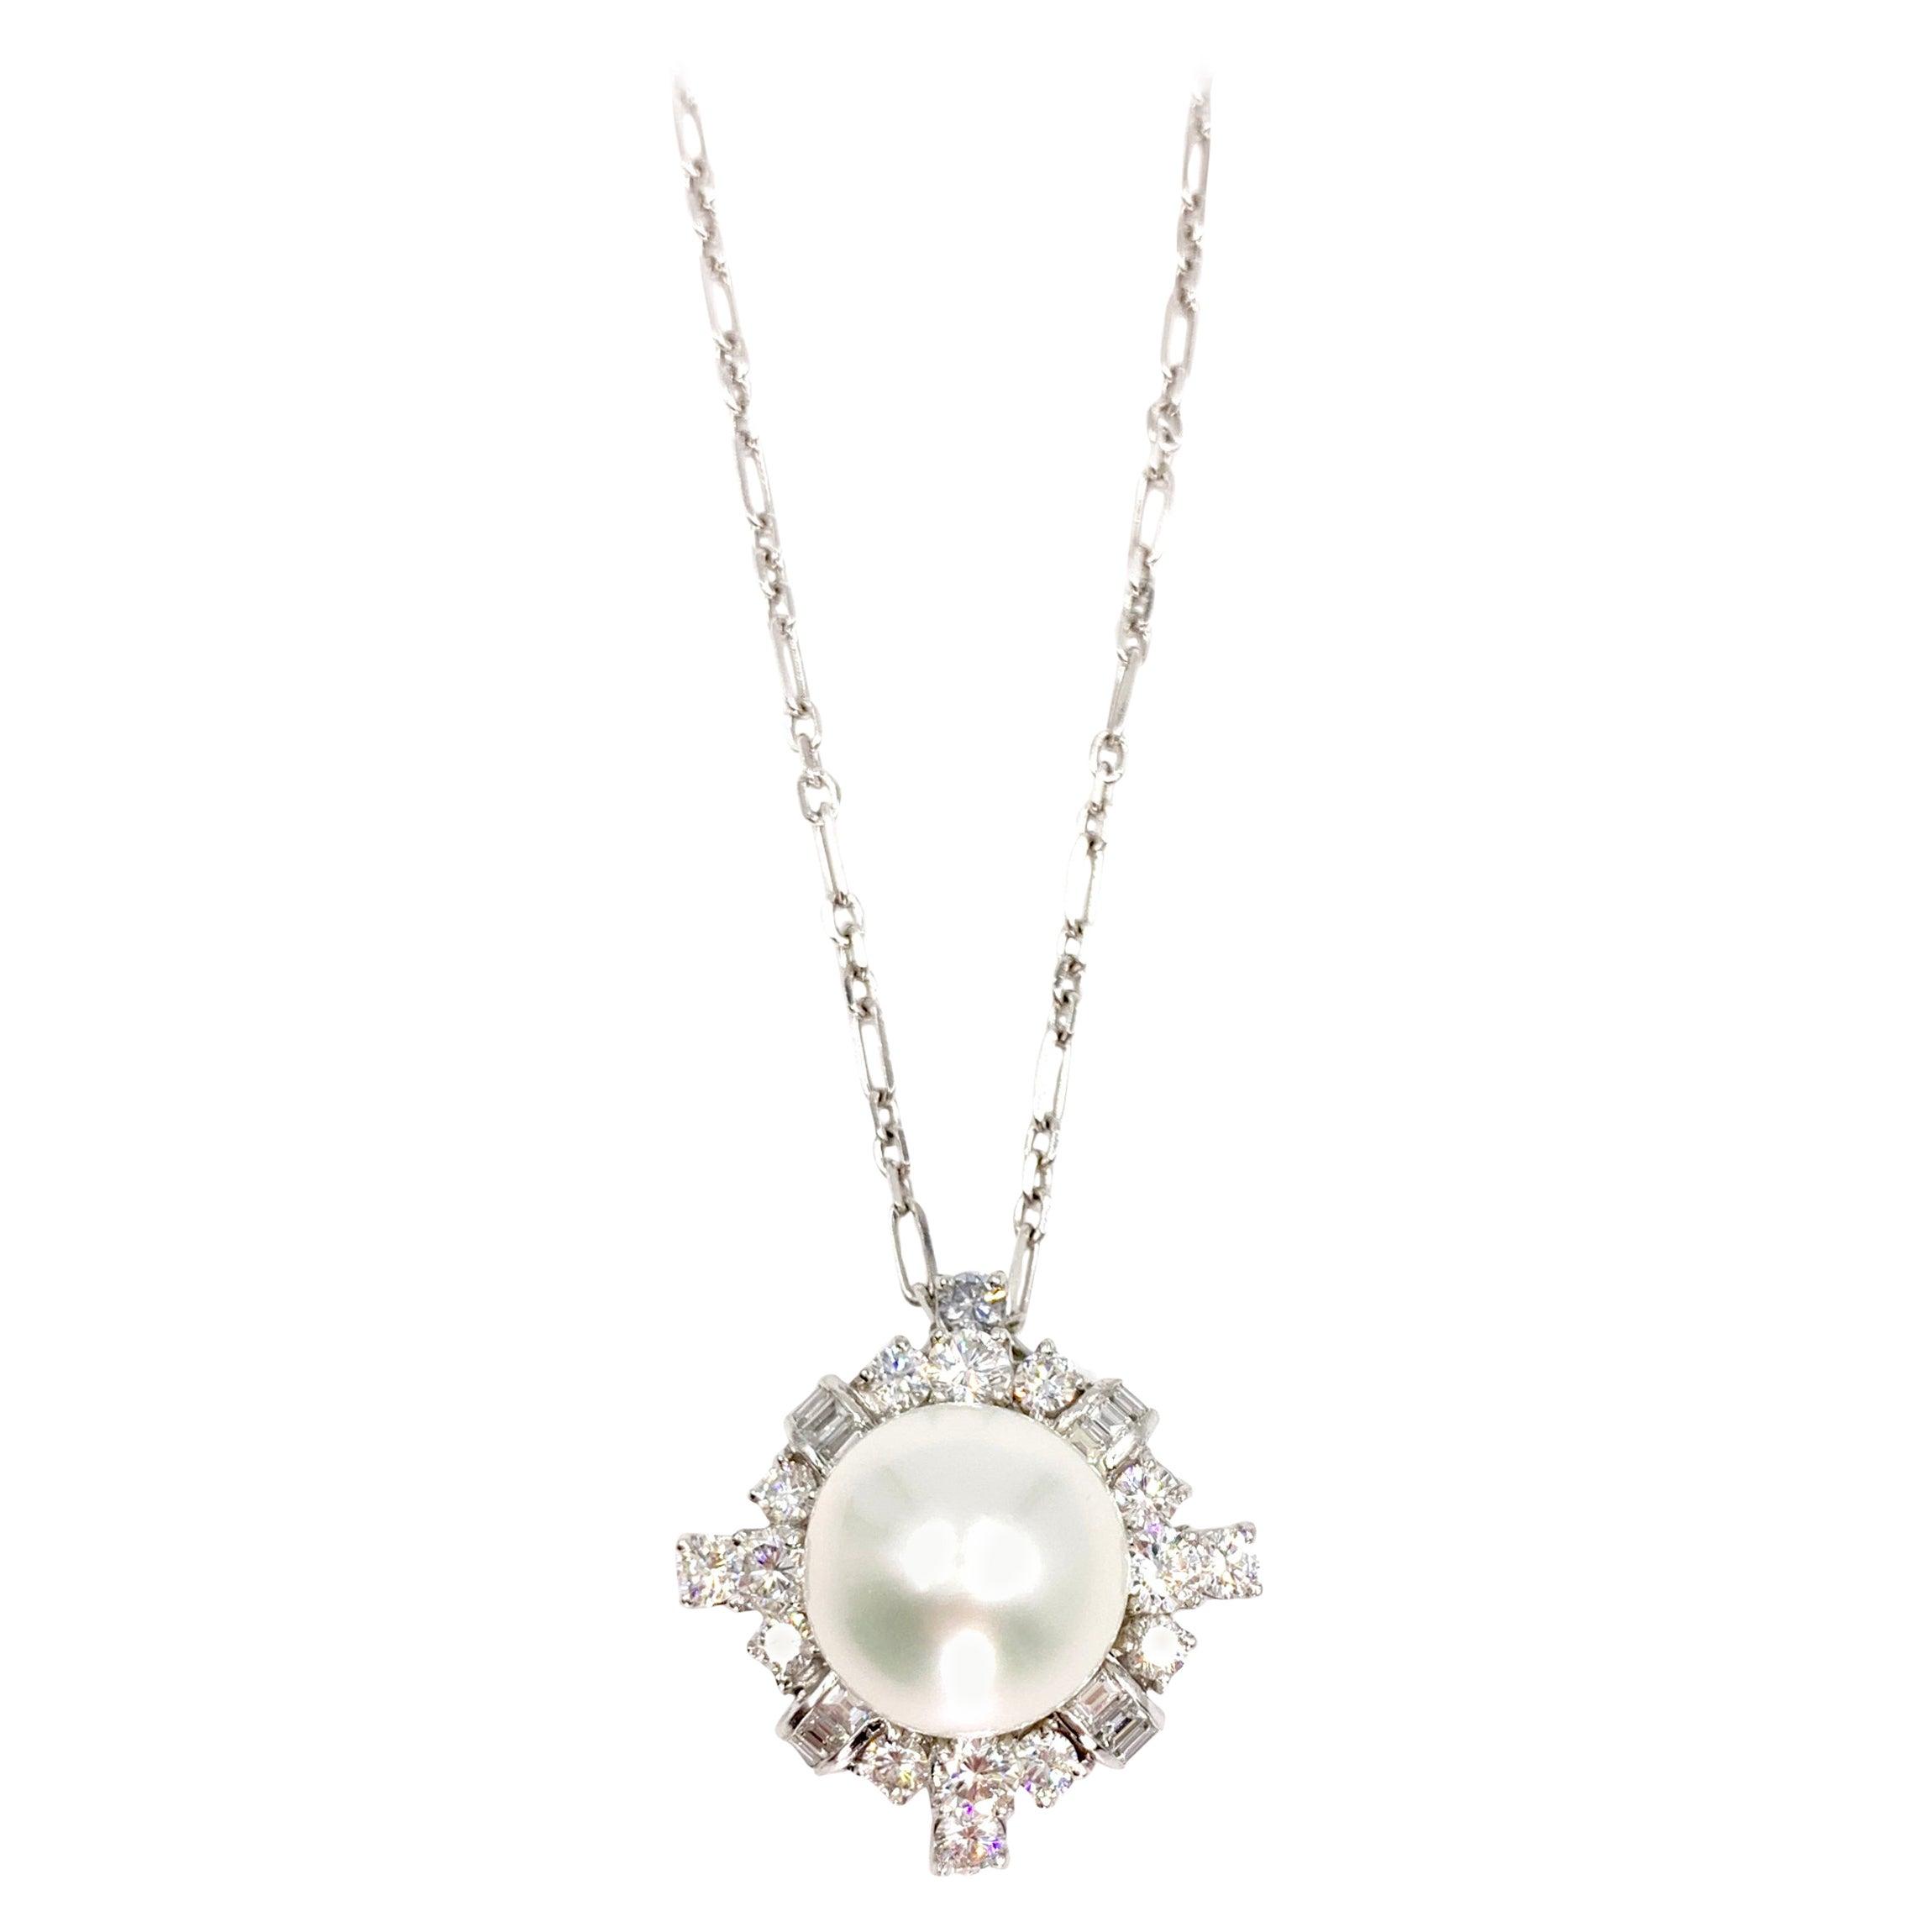 South Sea Pearl and Diamond Platinum Pendant Necklace